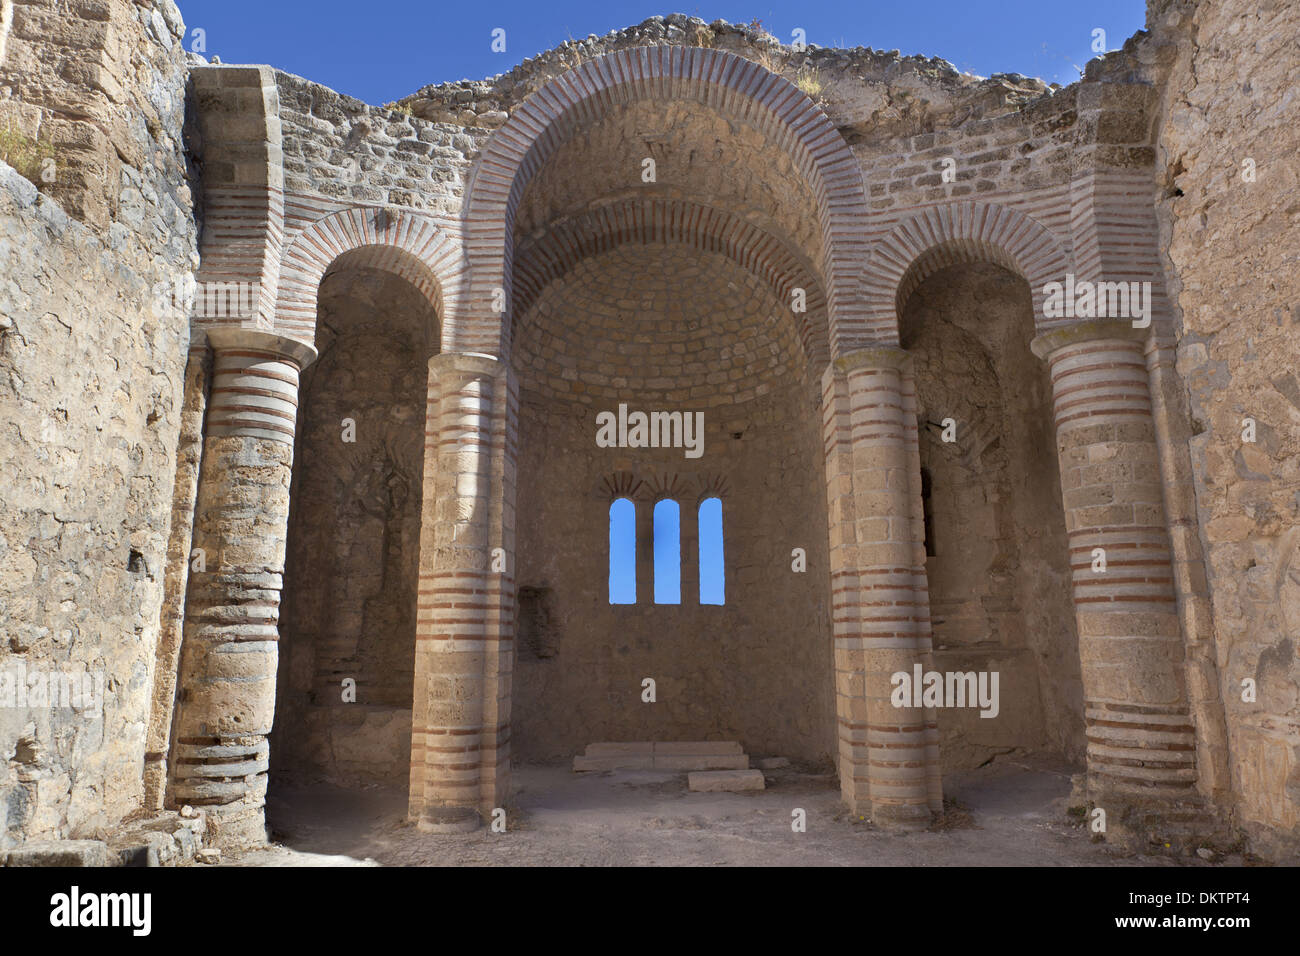 Church at The Saint Hilarion Castle in Cyprus near Kyrenia. - Stock Image